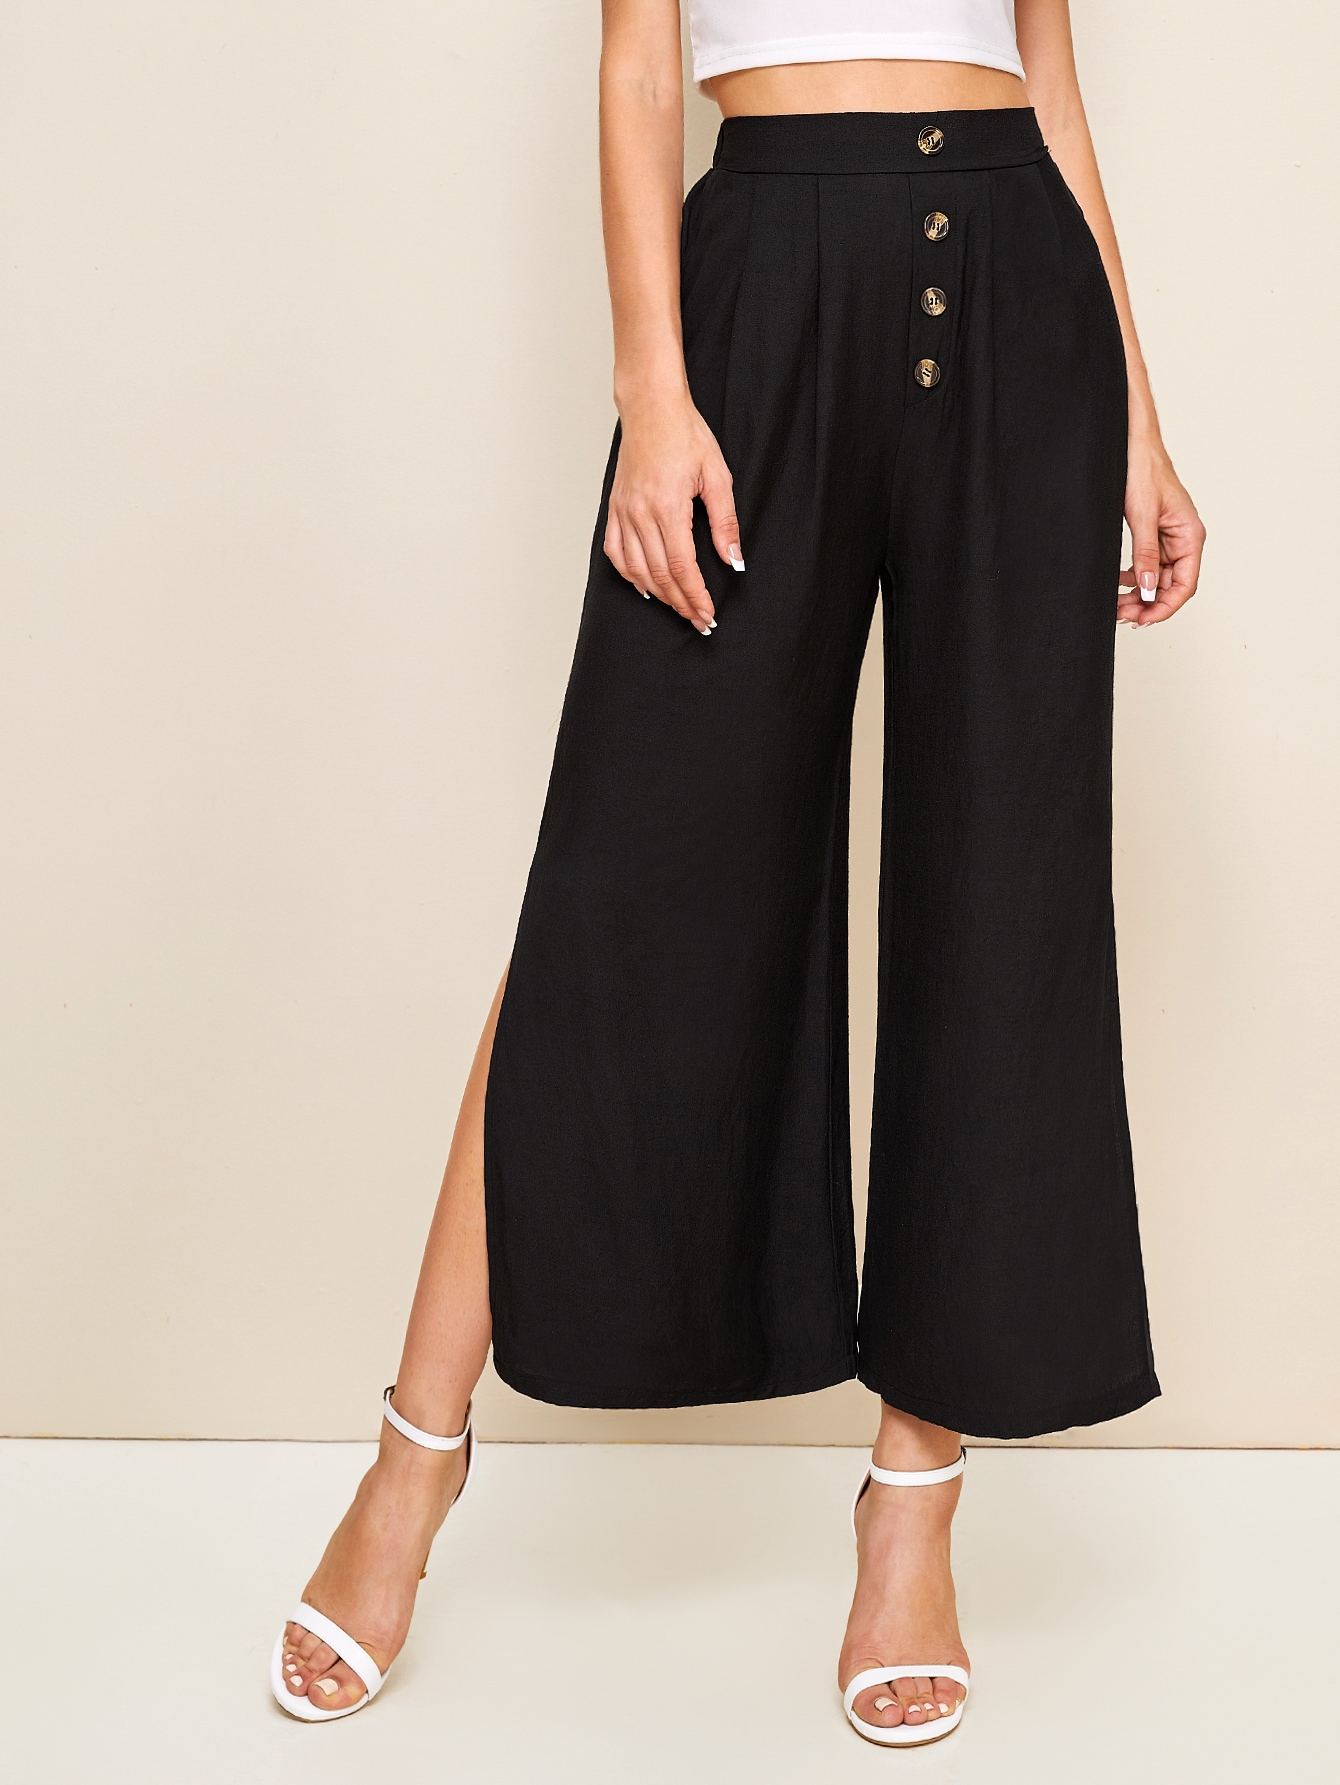 Фото - Широкие брюки с разрезом и пуговицами от SheIn черного цвета